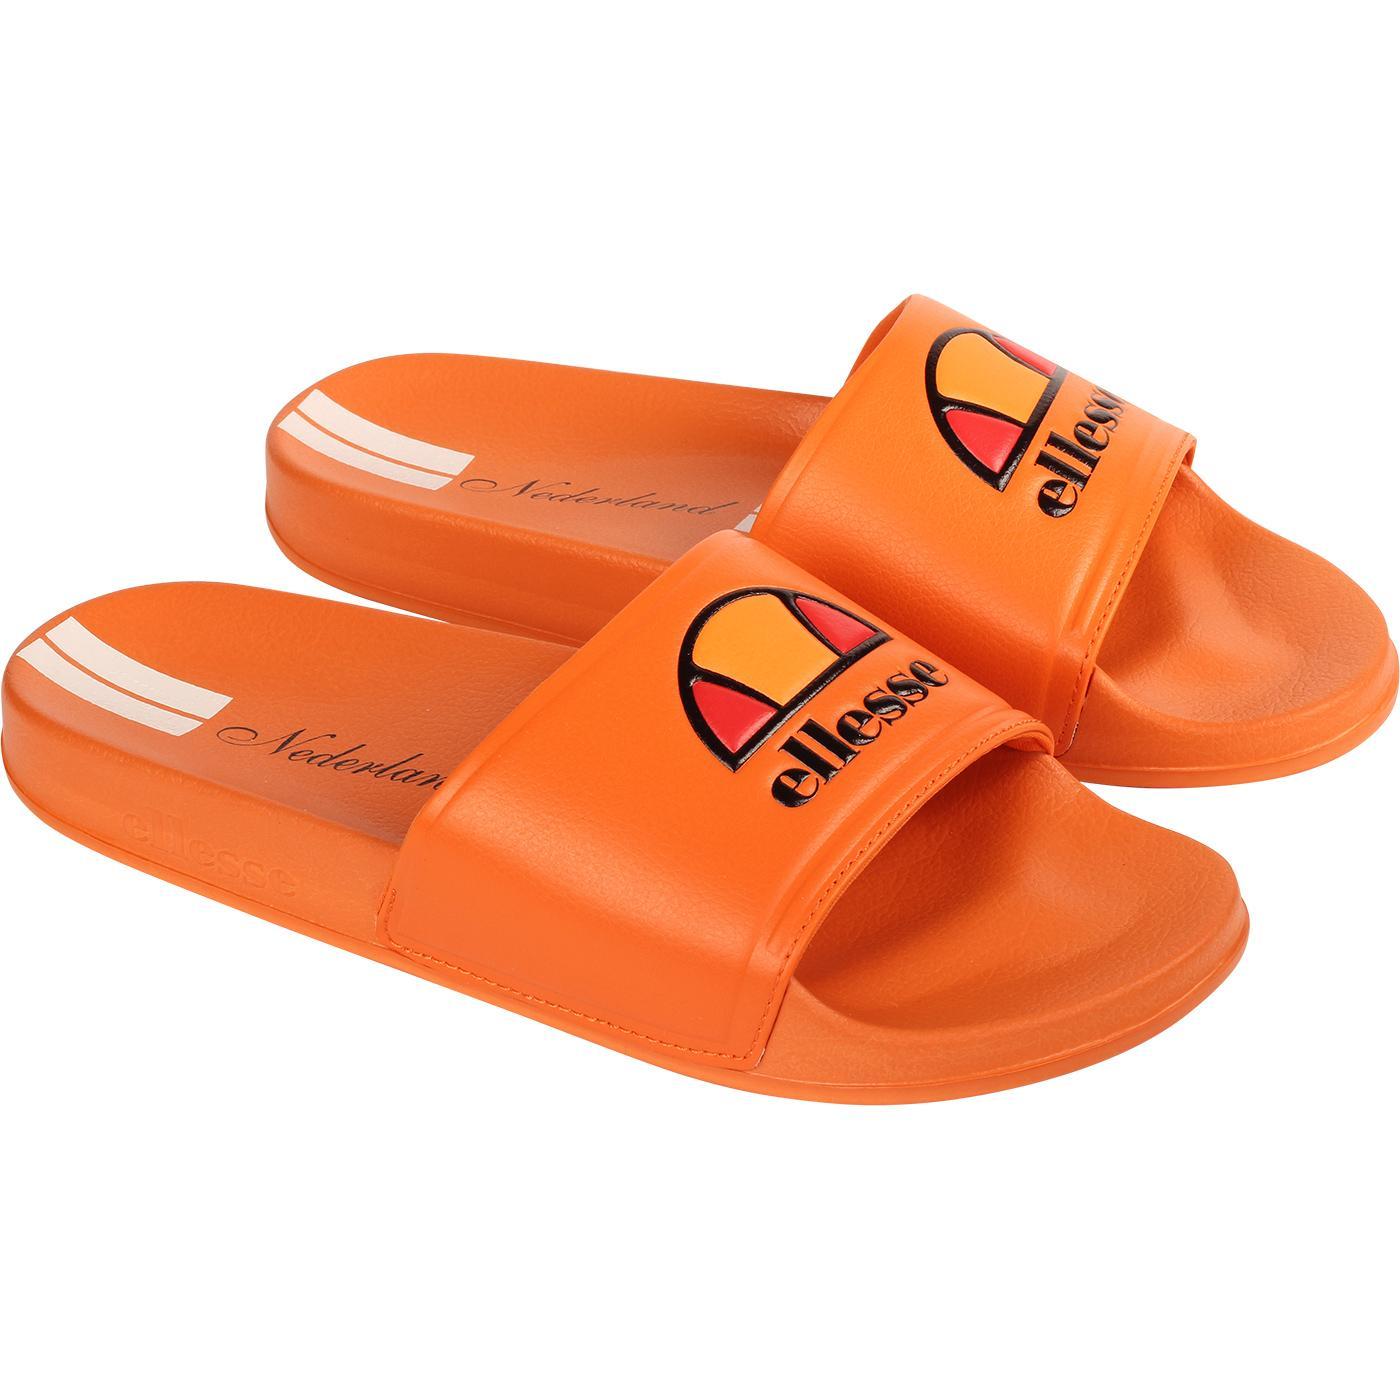 Joga ELLESSE Retro Slide Sandal (Netherlands)